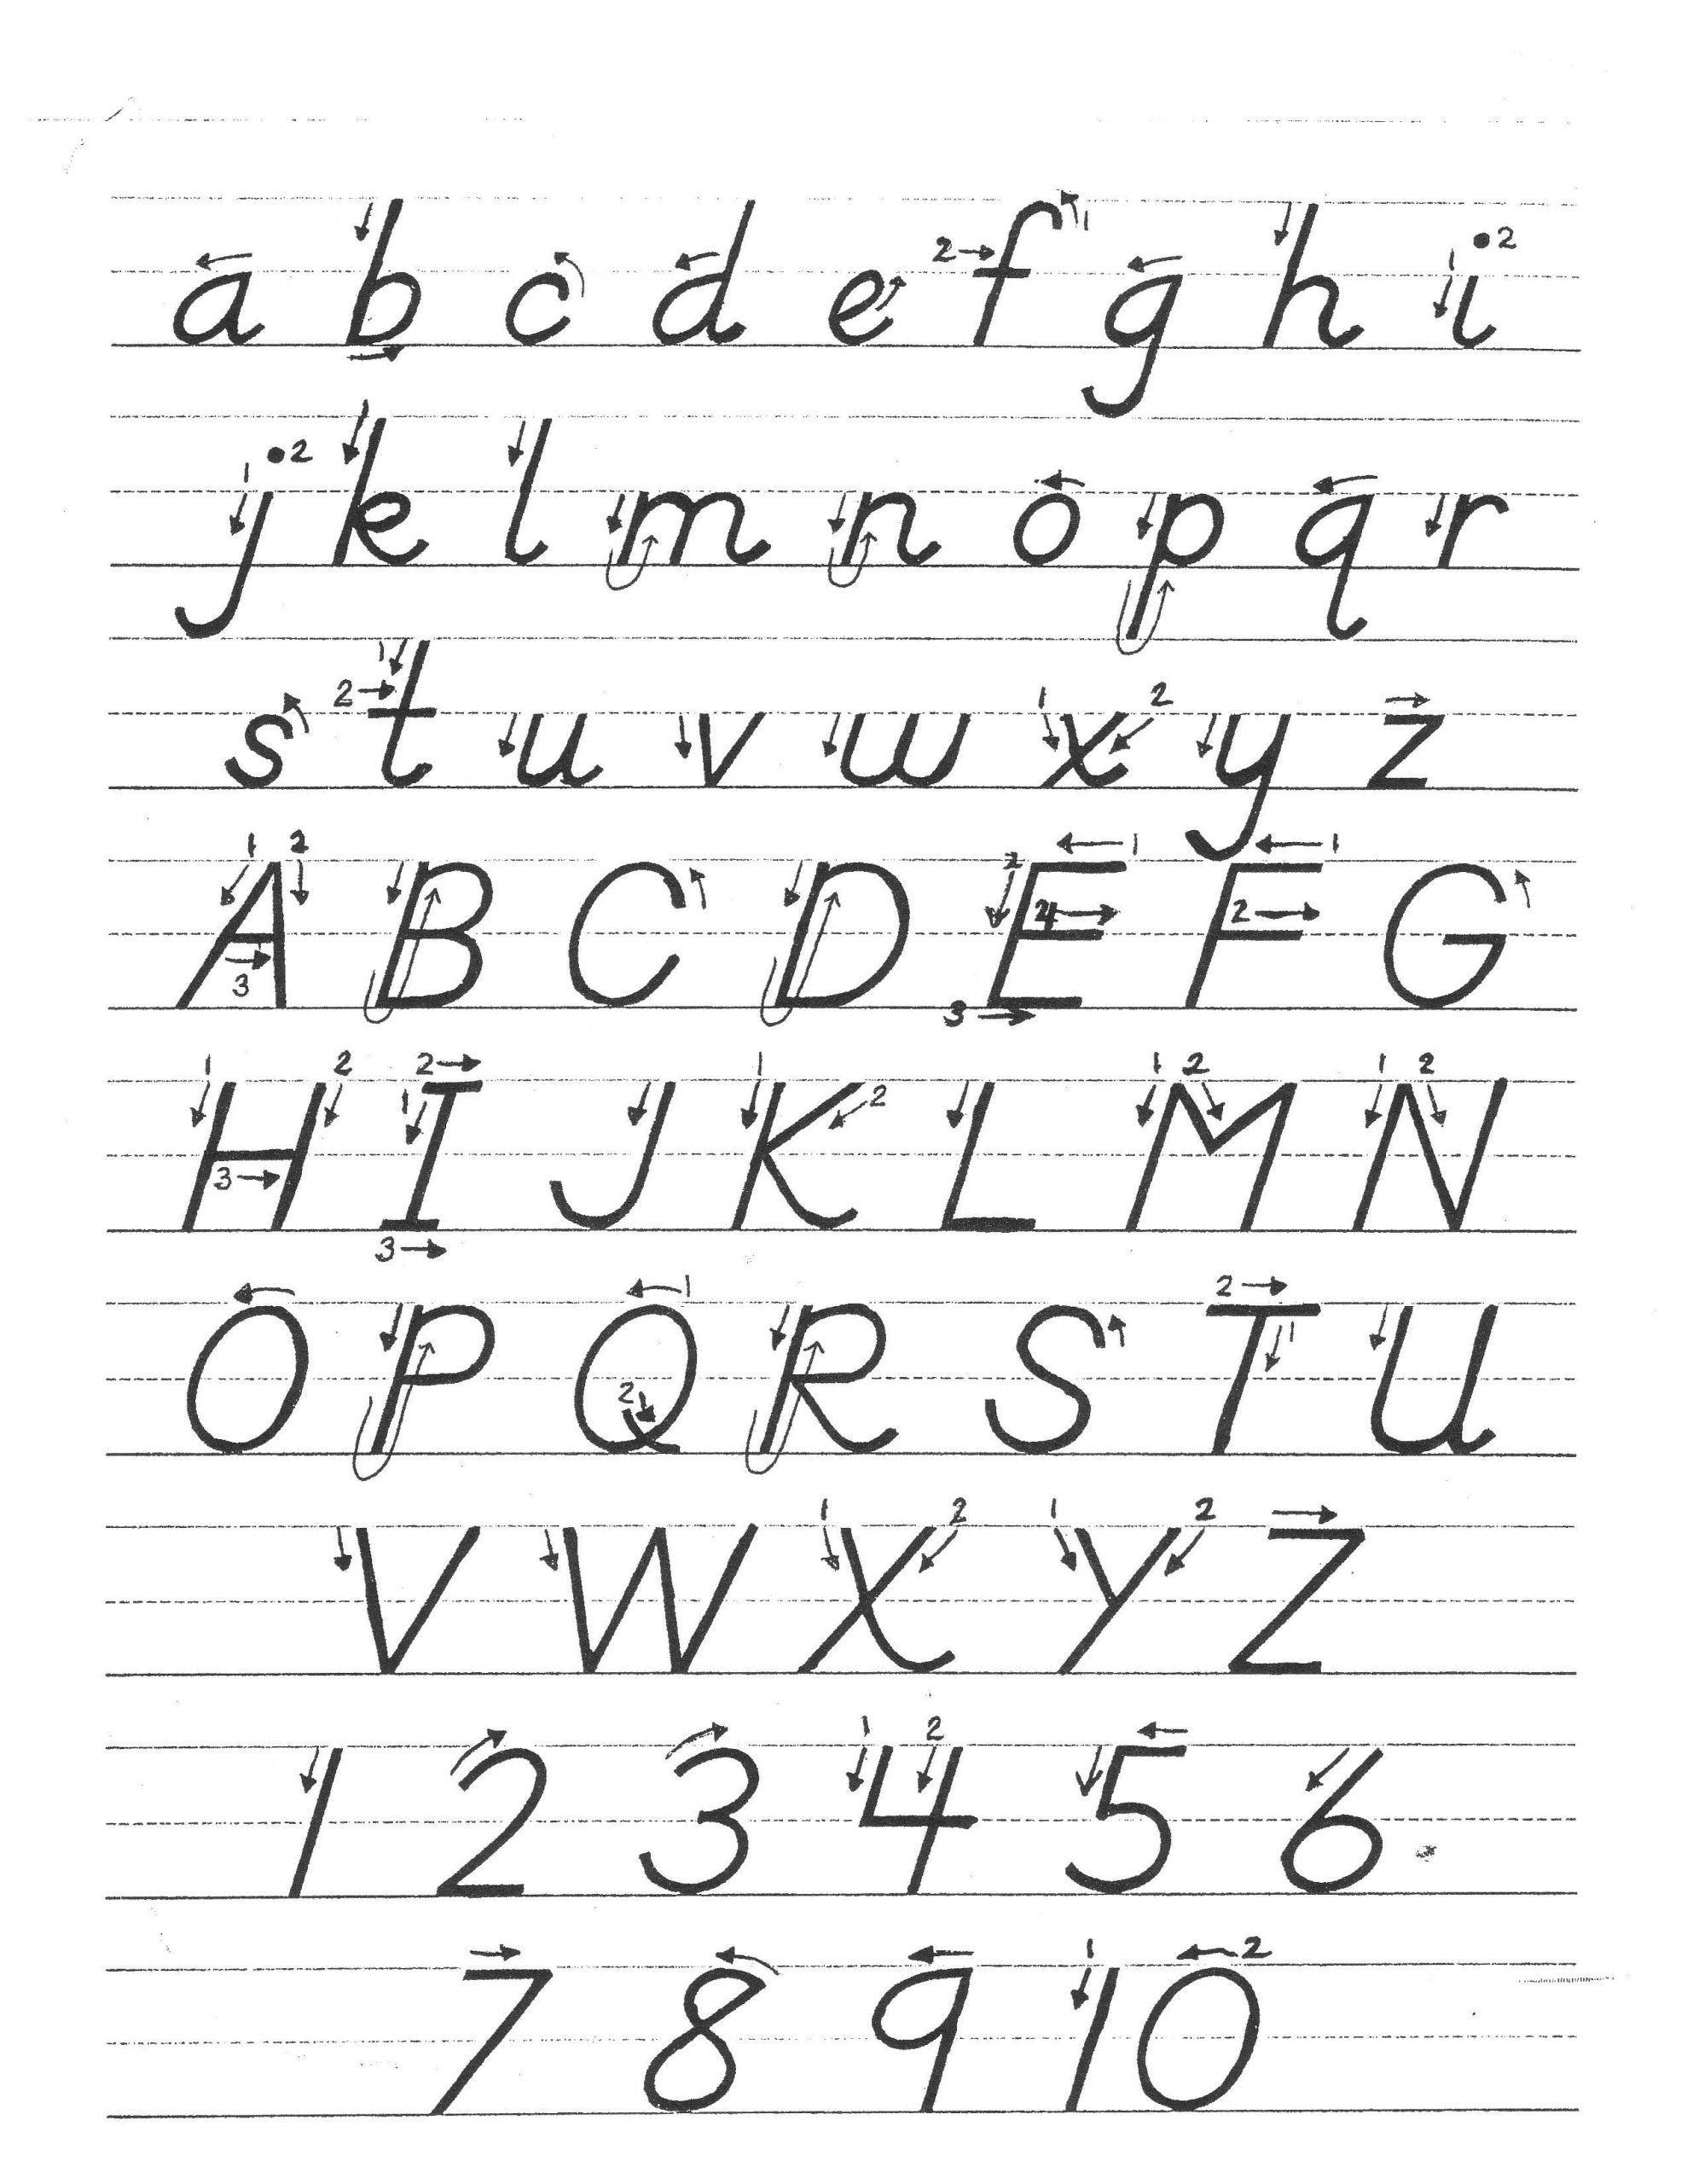 D Nealian Alphabet Worksheets Image Result For D Nealian for D'nealian Alphabet Worksheets